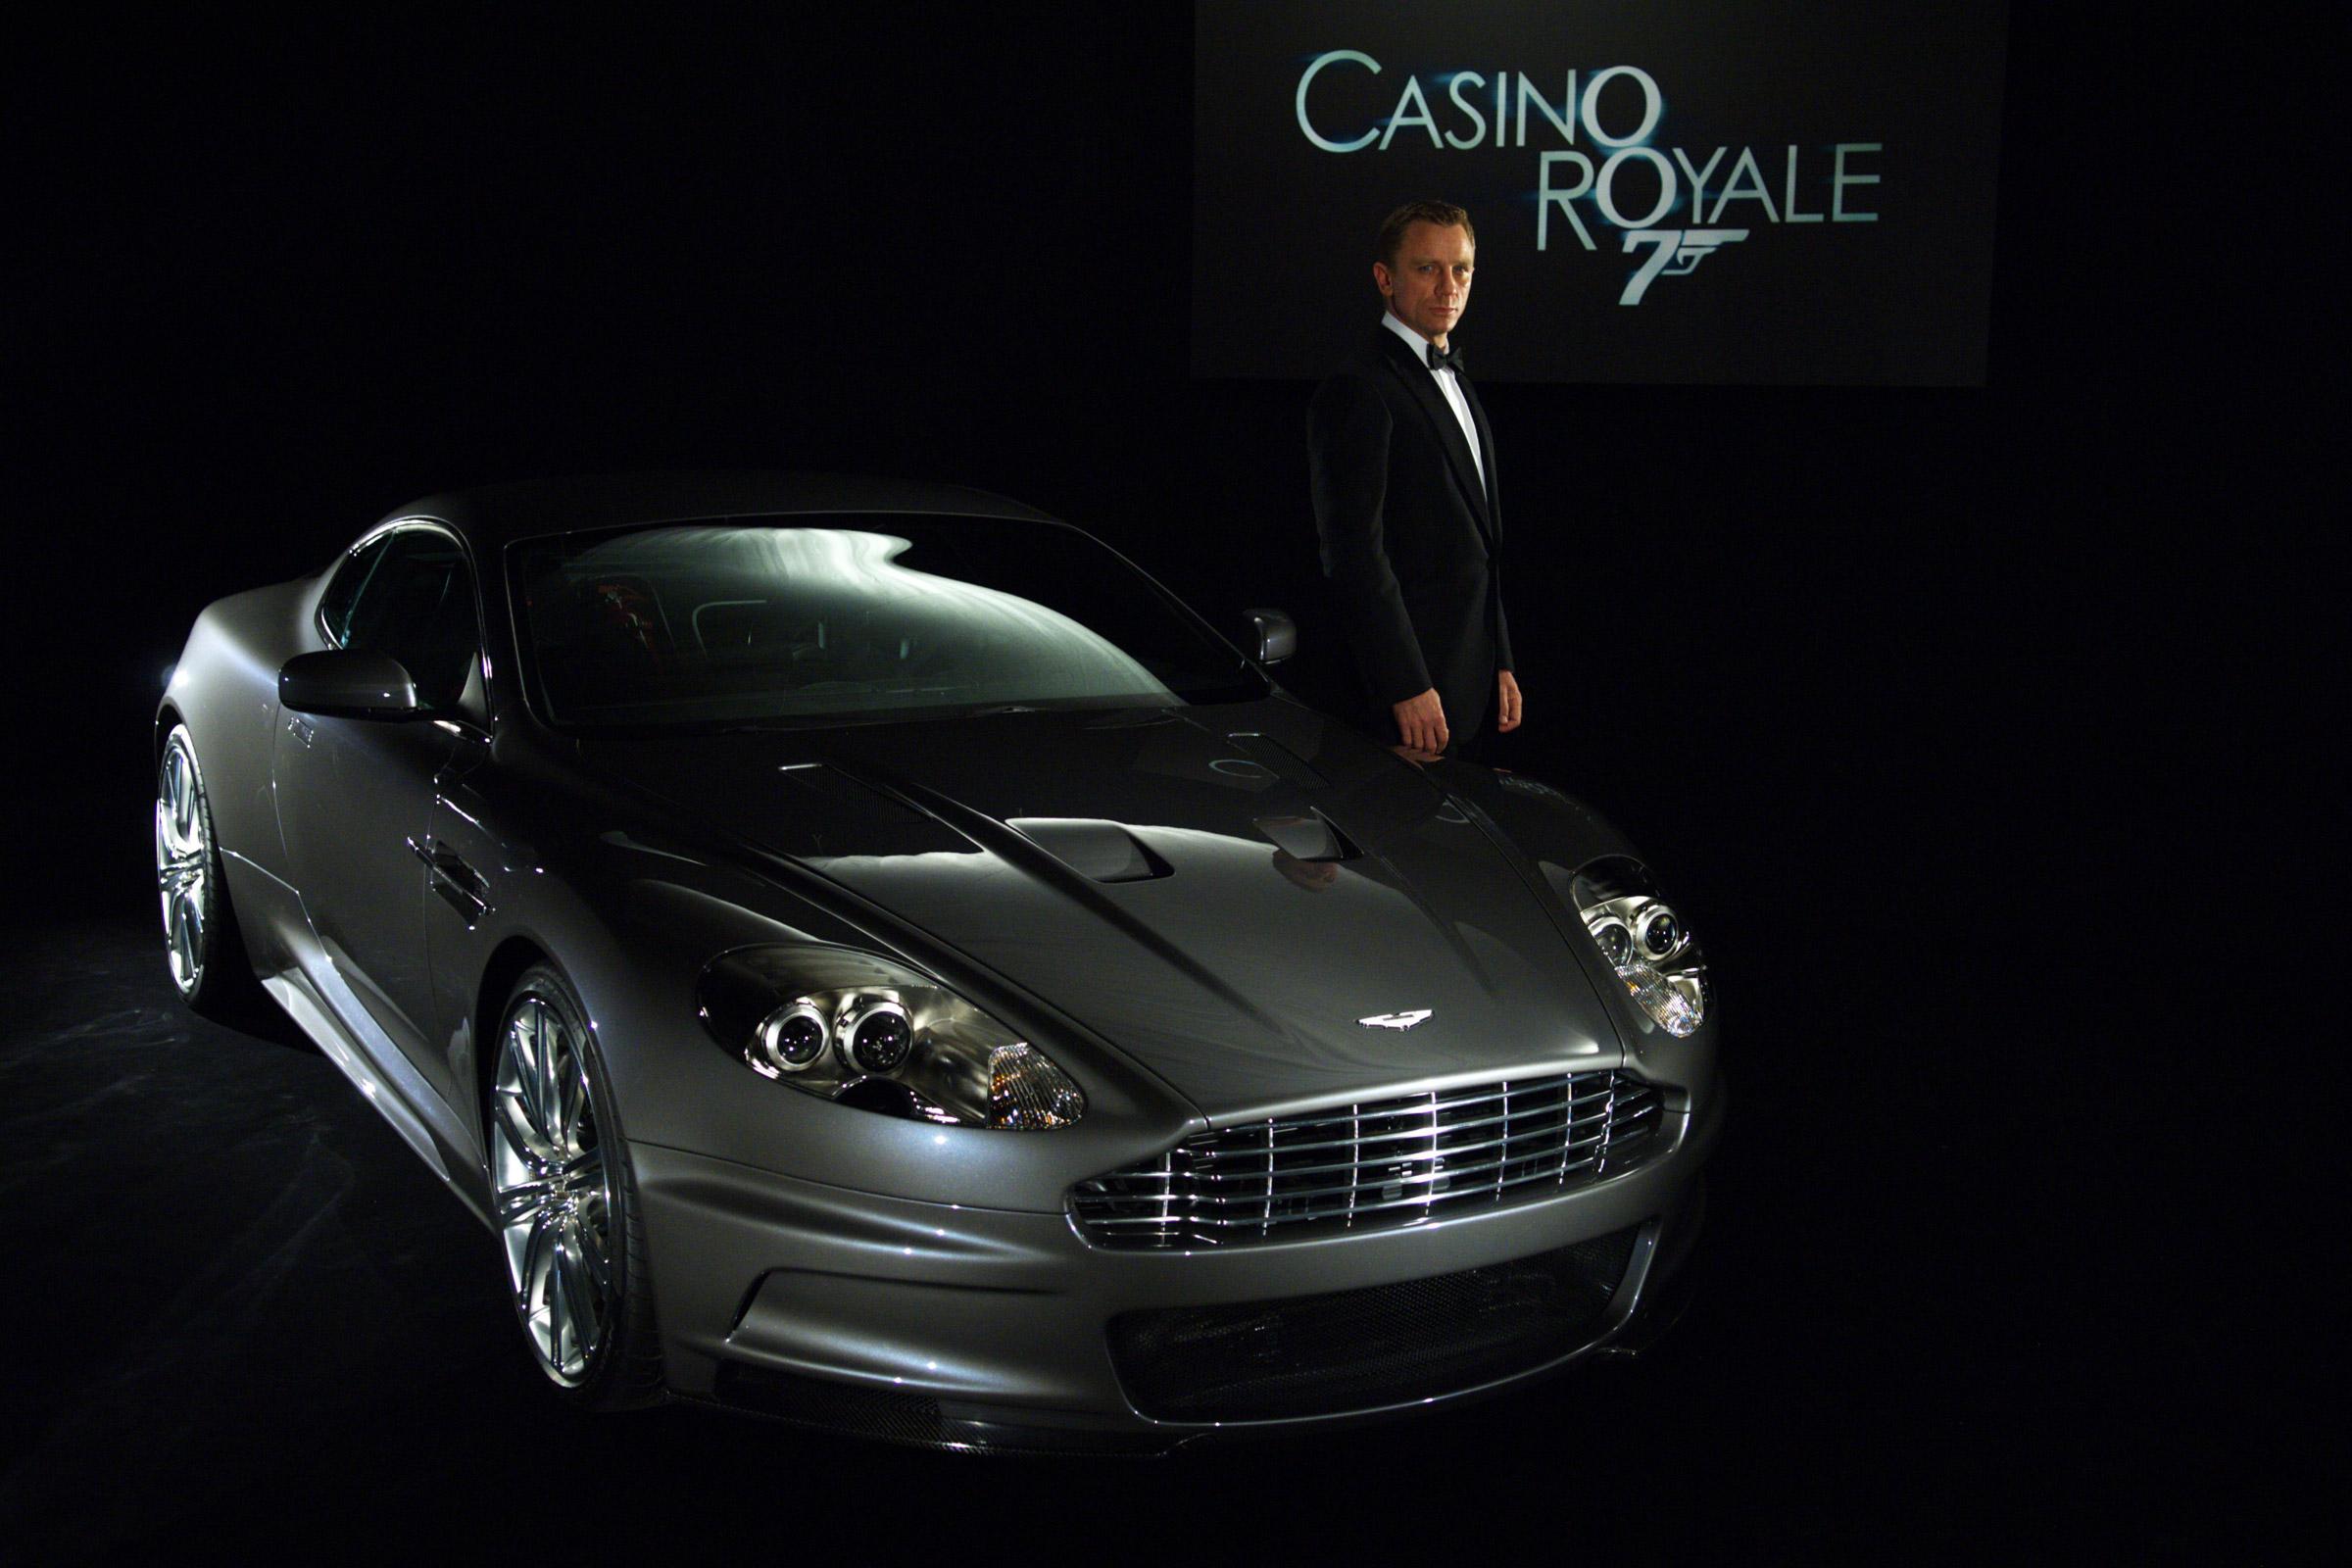 All cars in casino royale casino cash atm